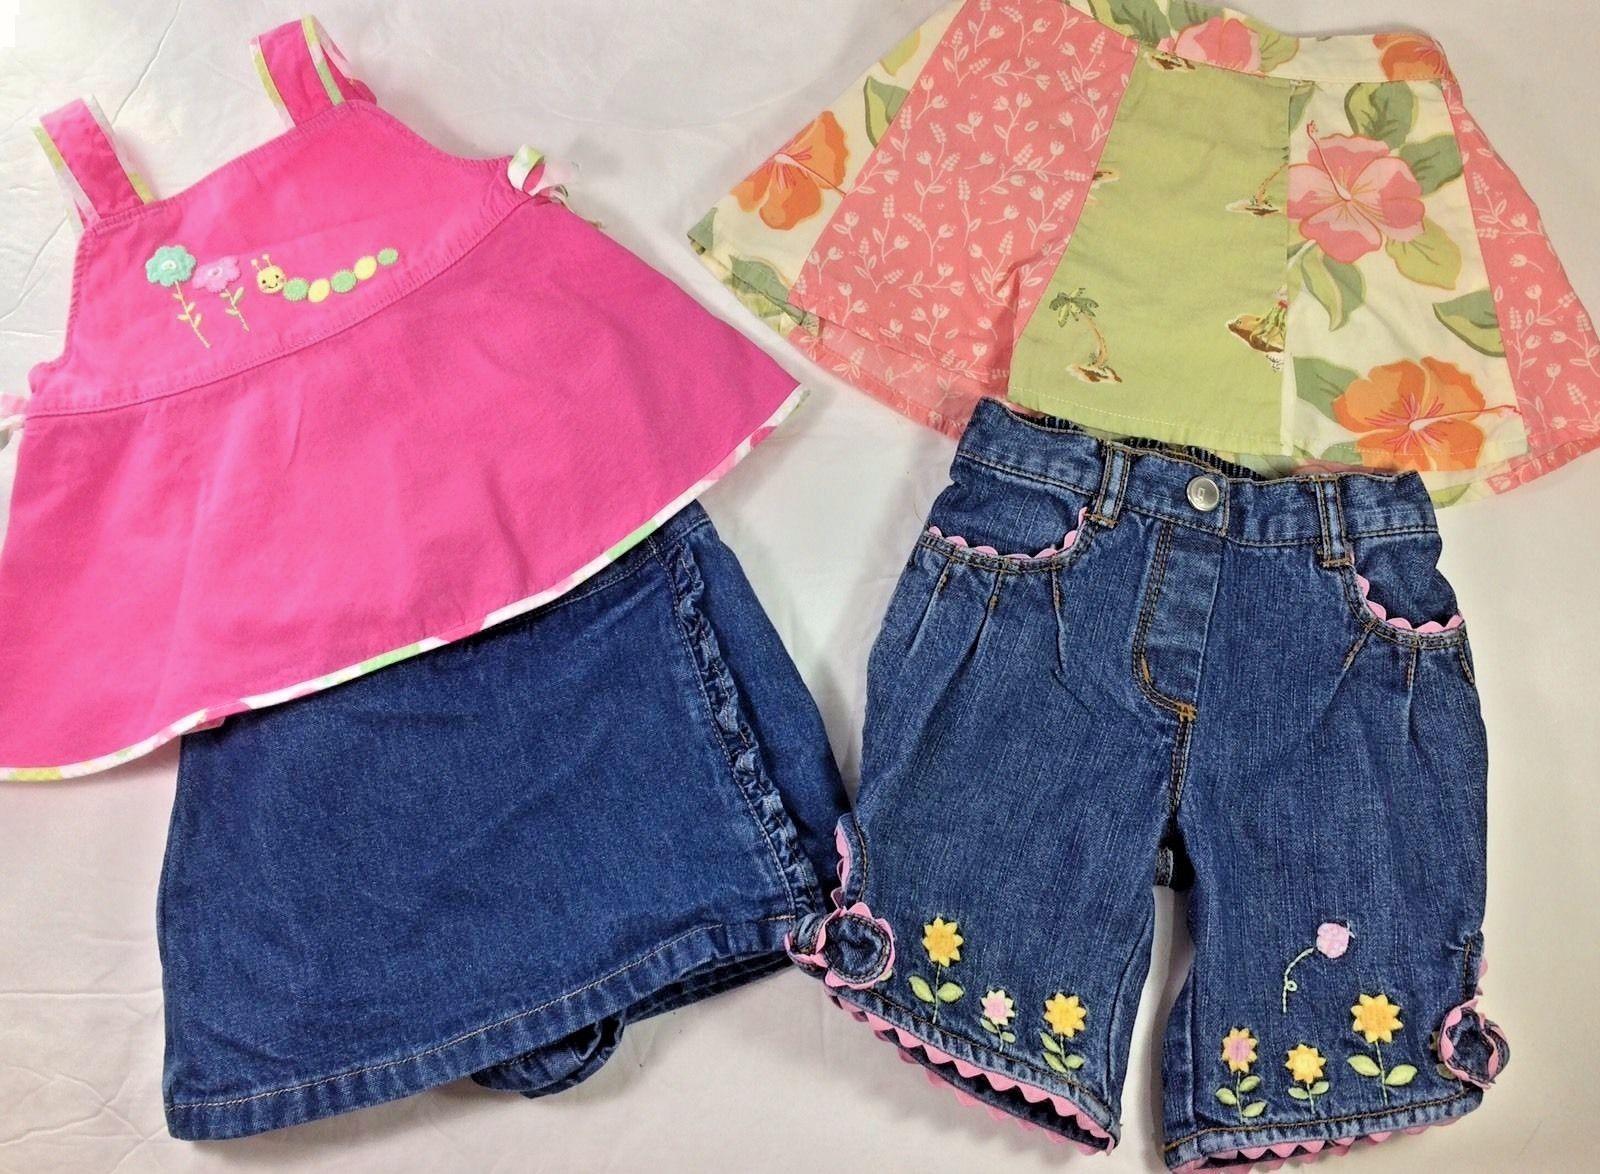 NWT Gymboree Baby Girl Fall Winter Dress Pants Shirt  Kitty ~ All in sz 3-6 Mo